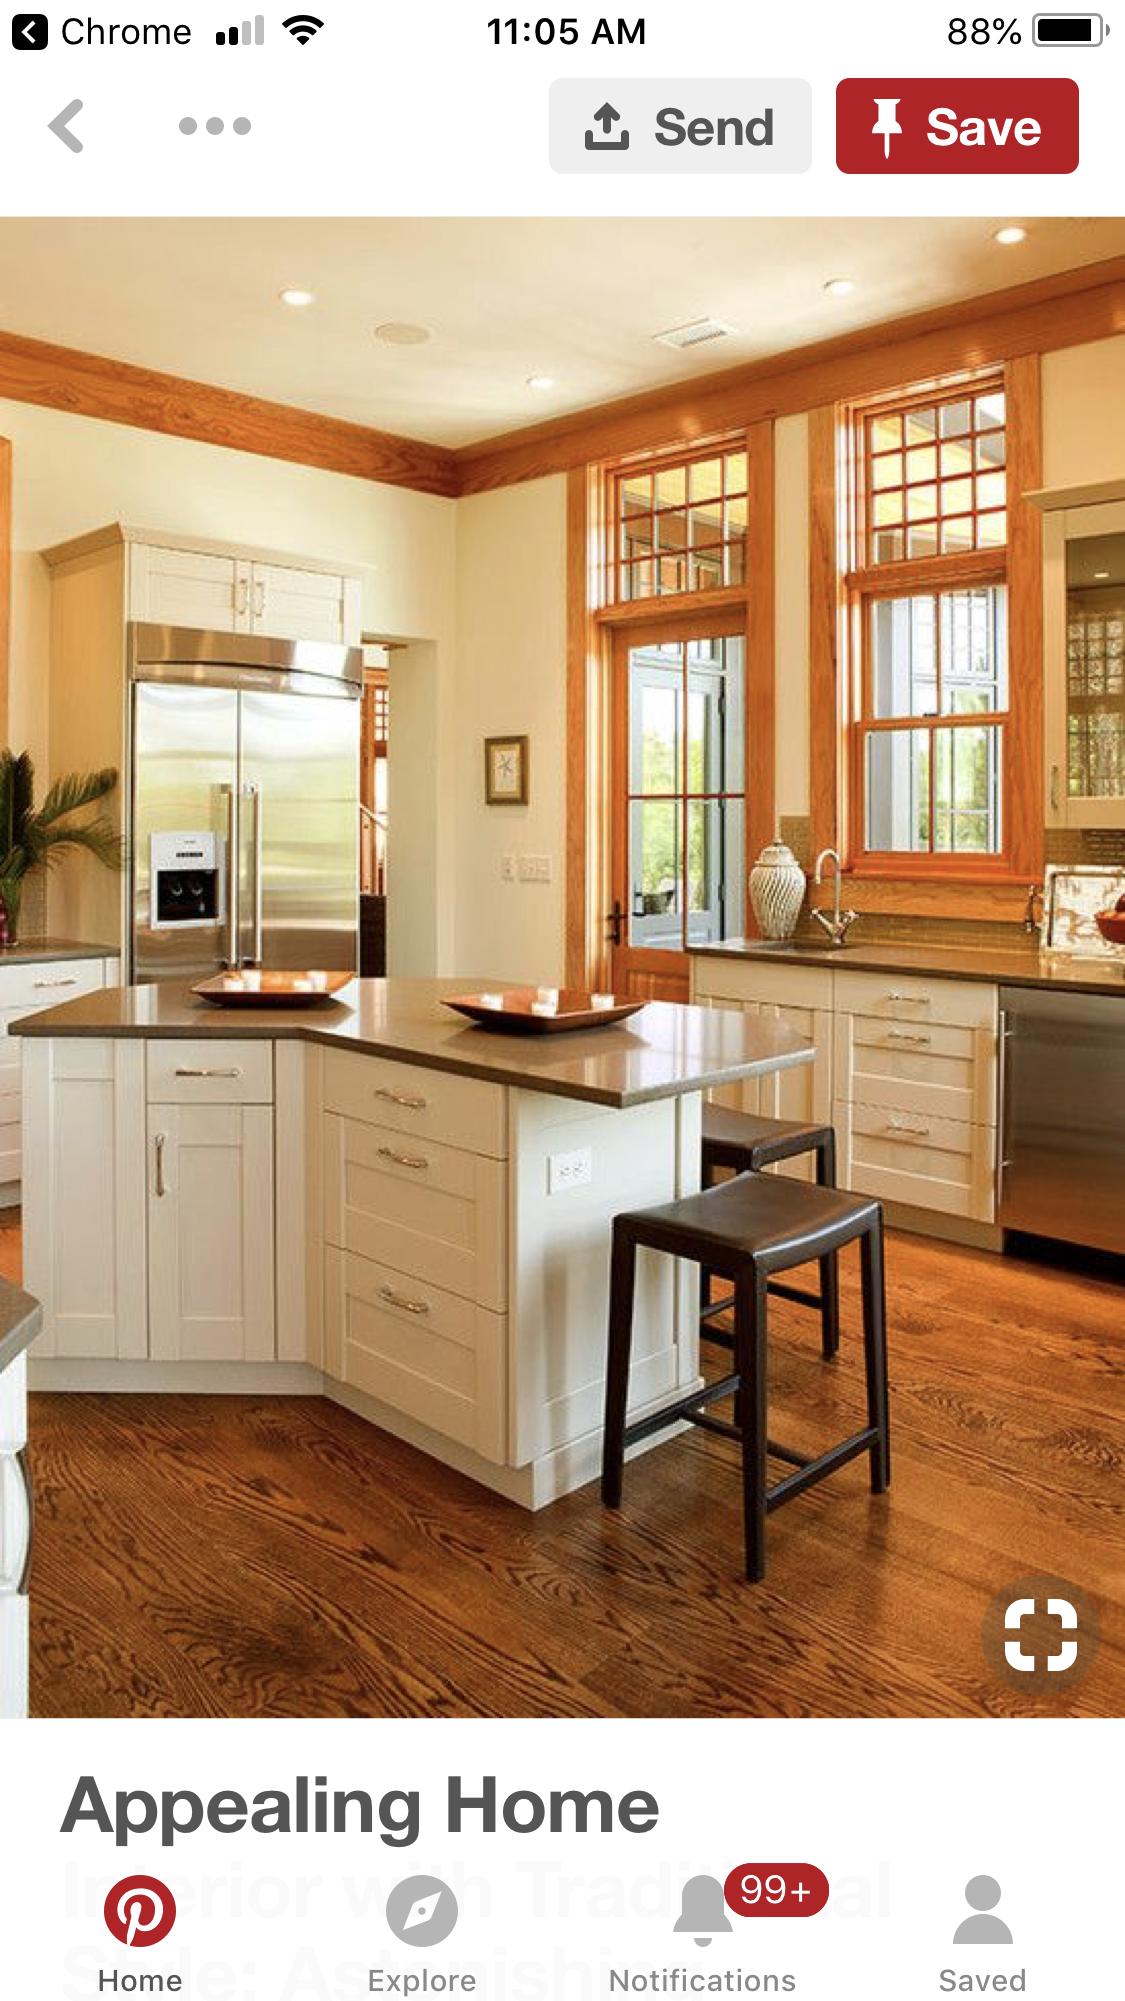 Pin By Nancy Walsh On Wood Trim And White Cabinets White Kitchen Oak Trim Vintage Kitchen Cabinets Crown Molding Kitchen